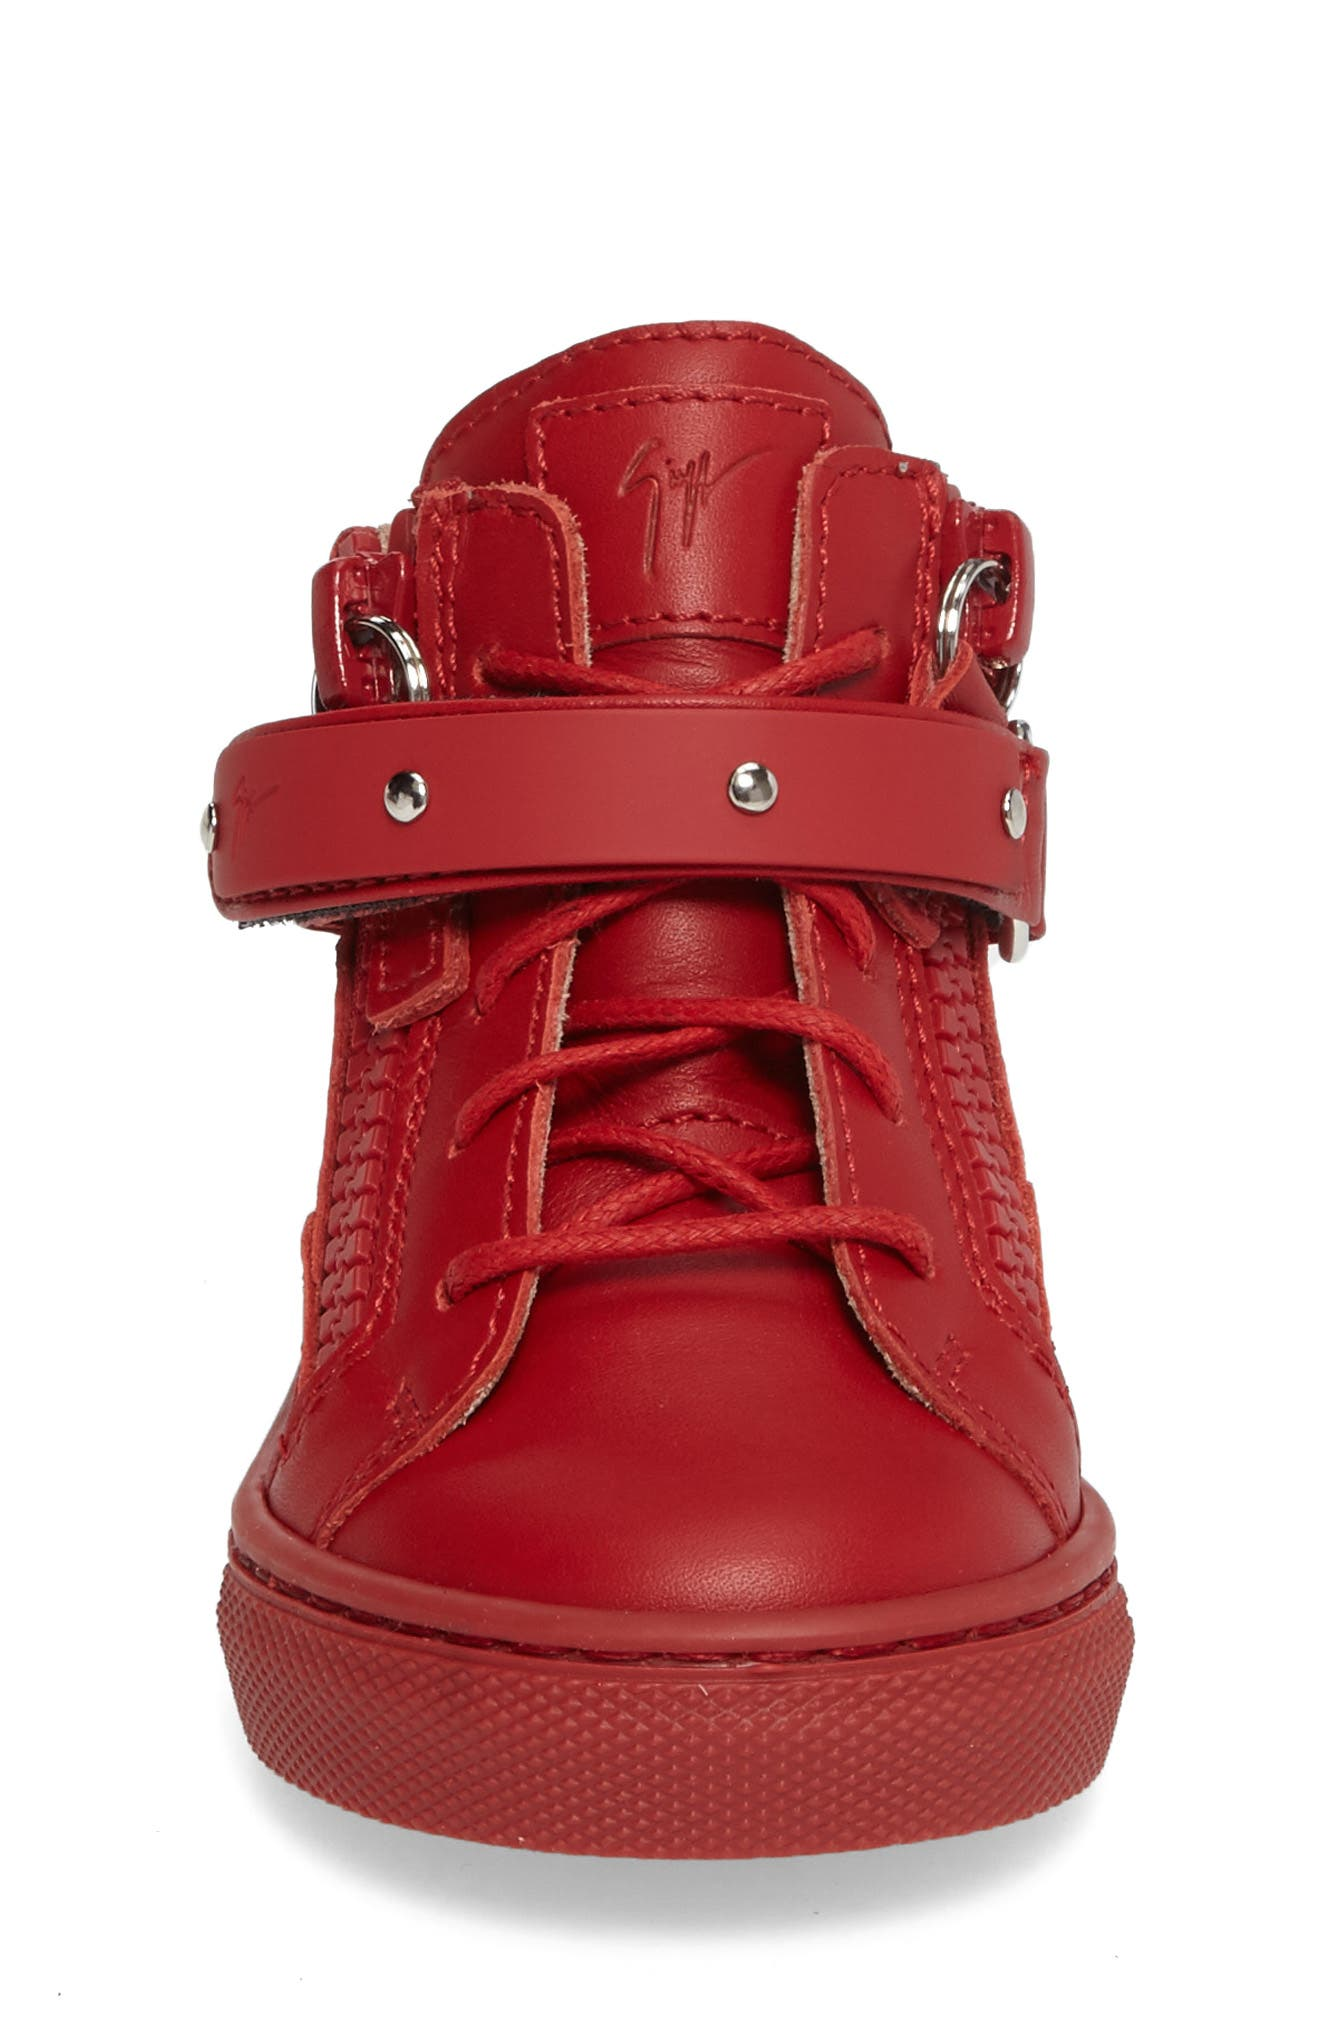 Taylor Junior High Top Sneaker,                             Alternate thumbnail 3, color,                             600